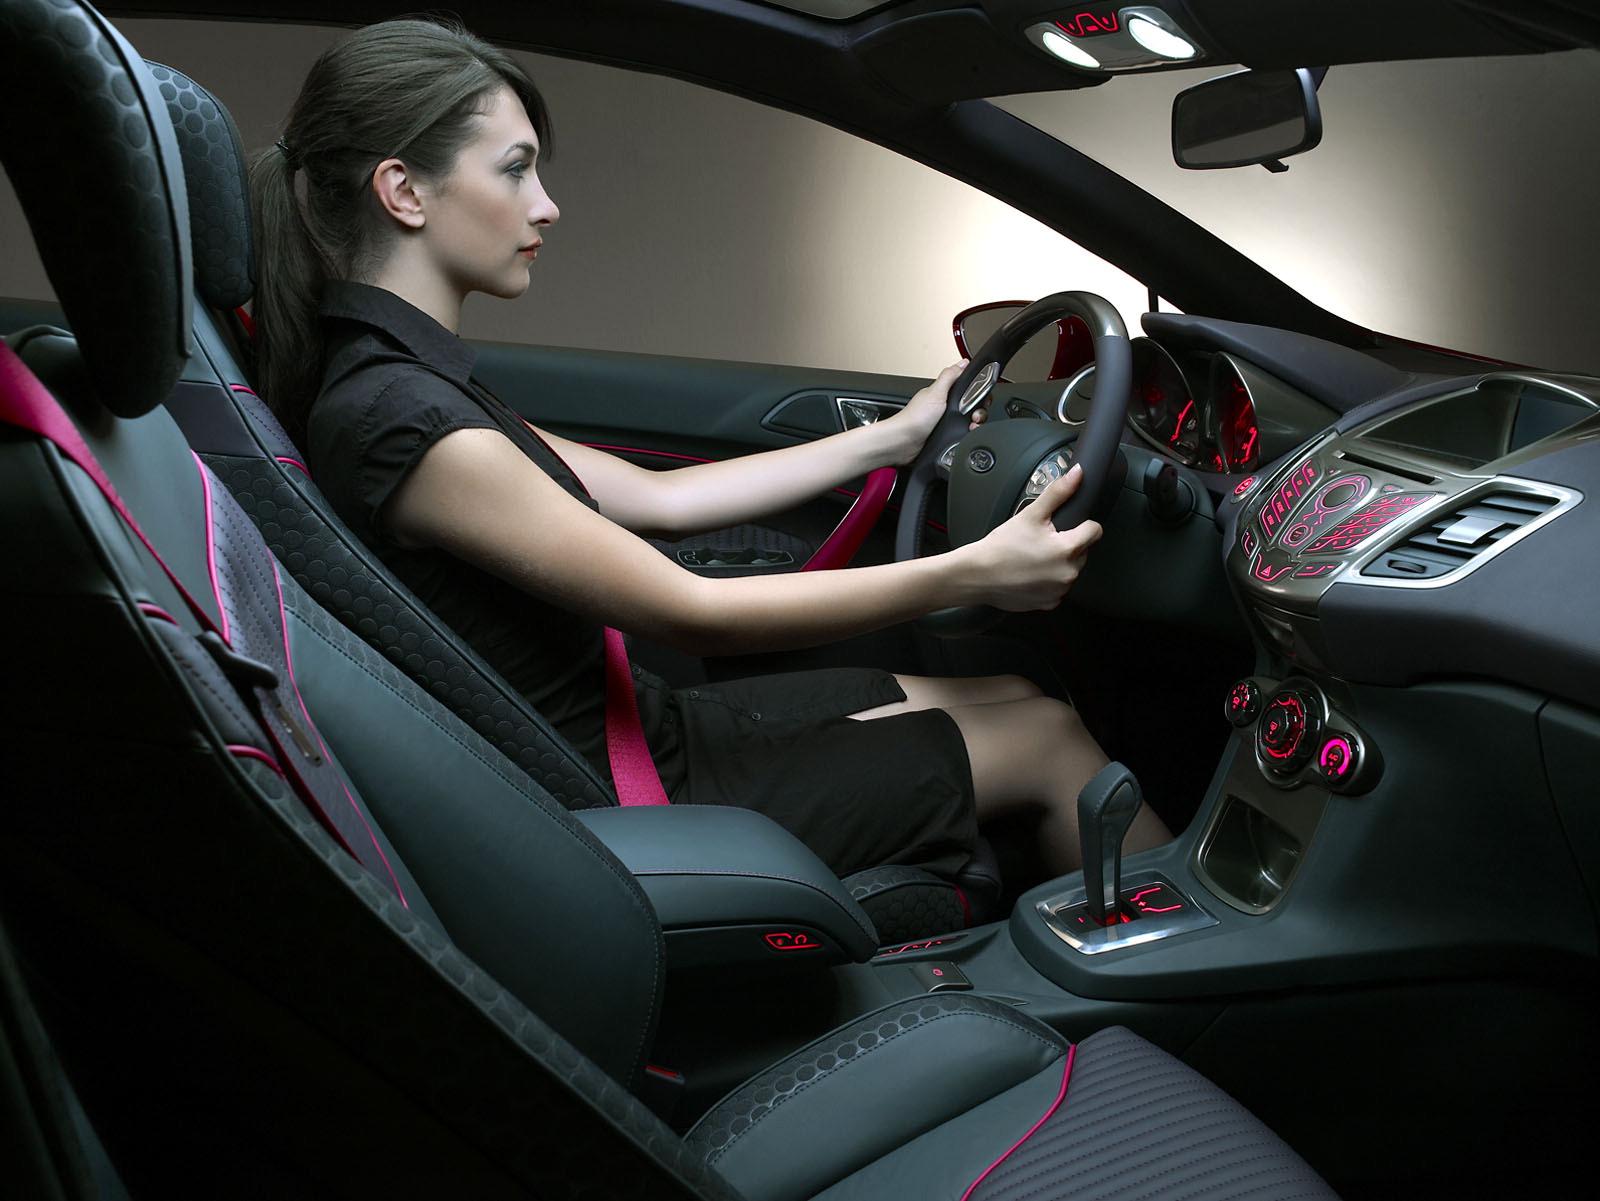 Девушка сидит в машине с цветами фото